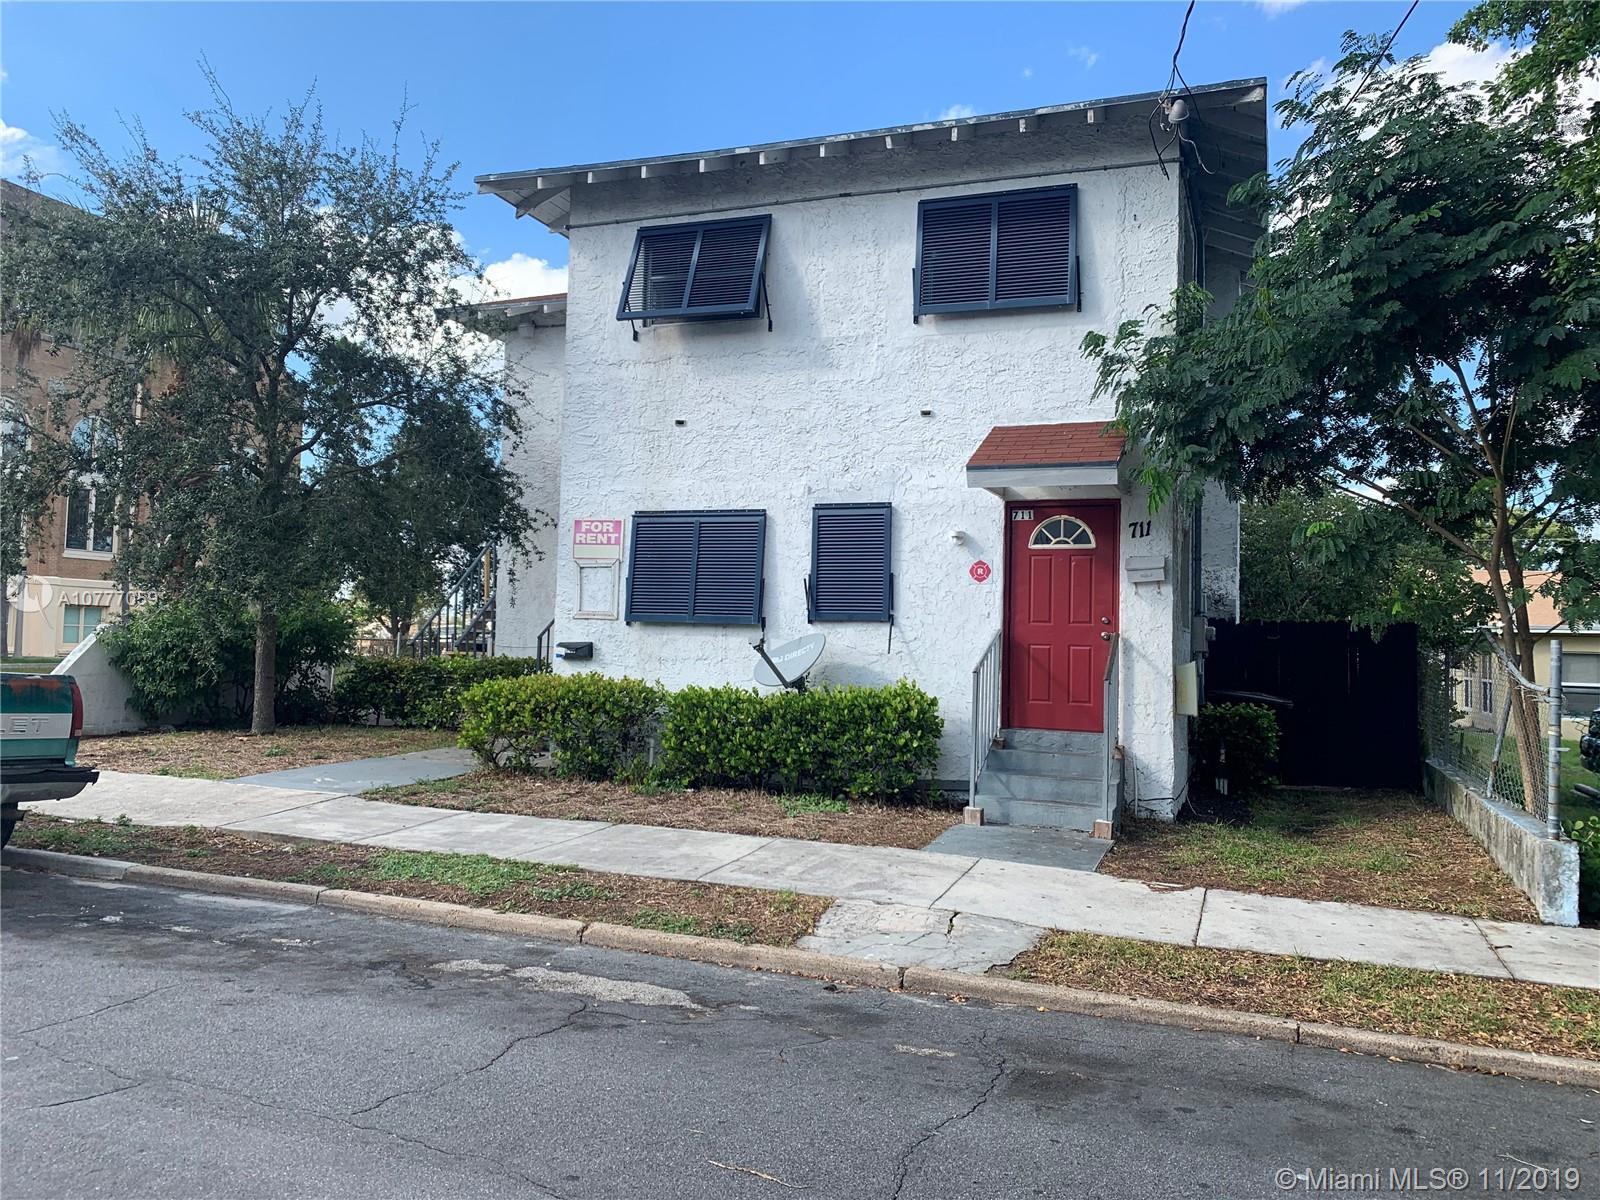 711 8th Street, West Palm Beach, FL 33401